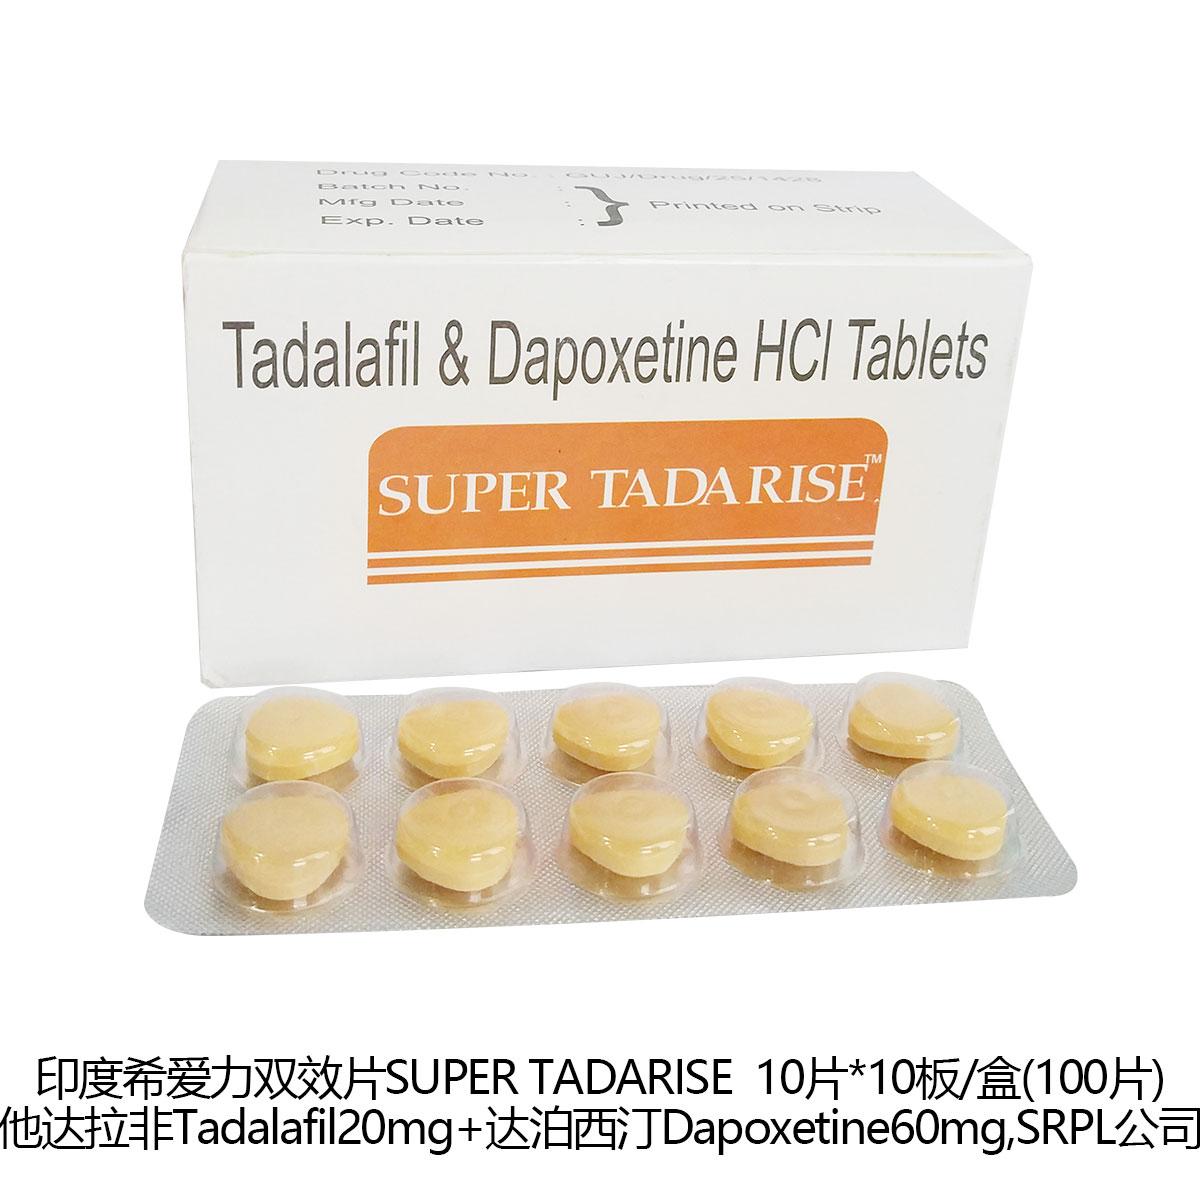 TD2060印度希爱力双效片SUPER TADARISE 10片/板